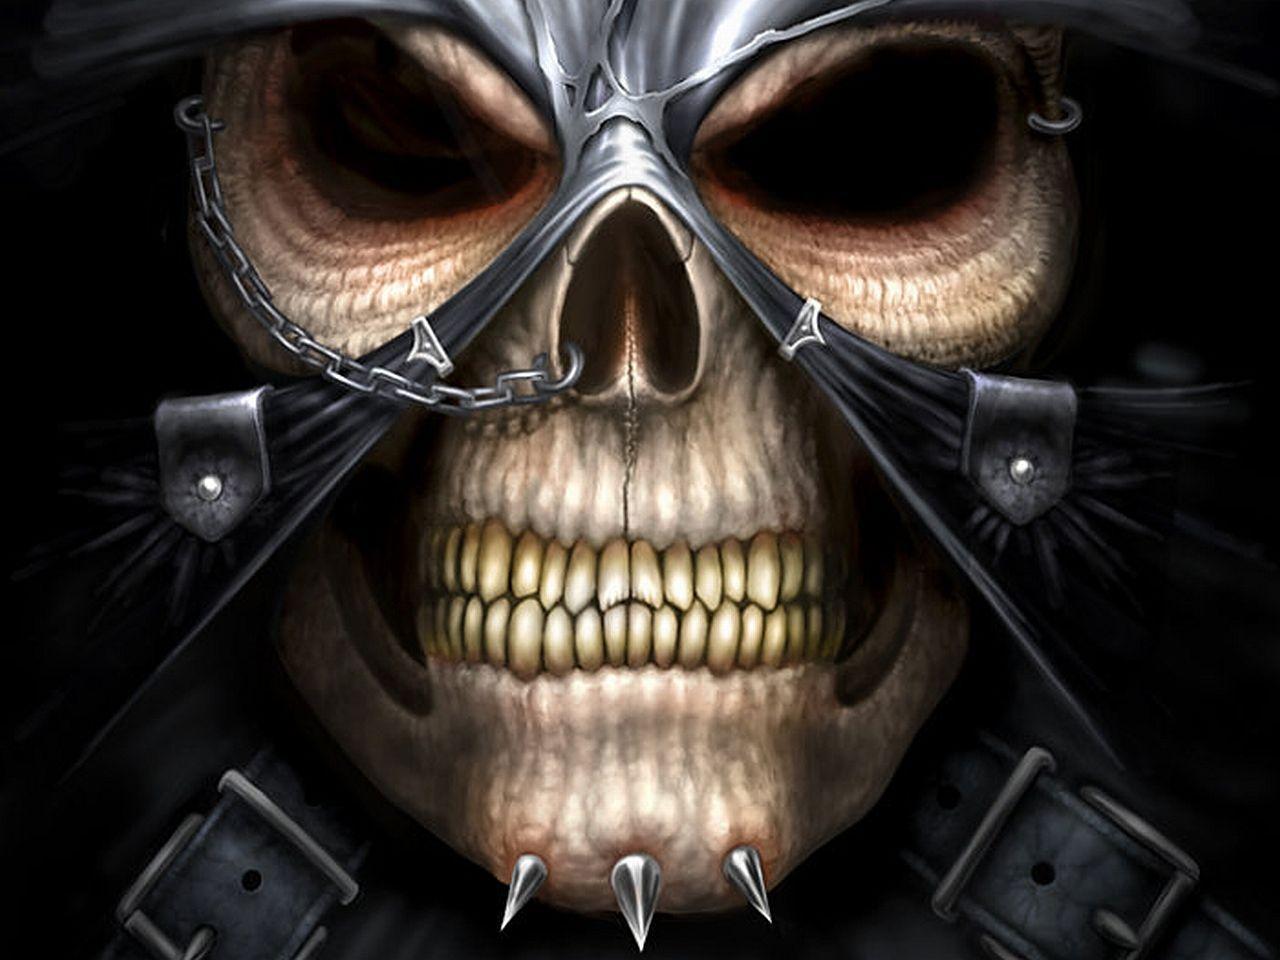 Biker Skull and Cross Wallpapers - Top Free Biker Skull and Cross